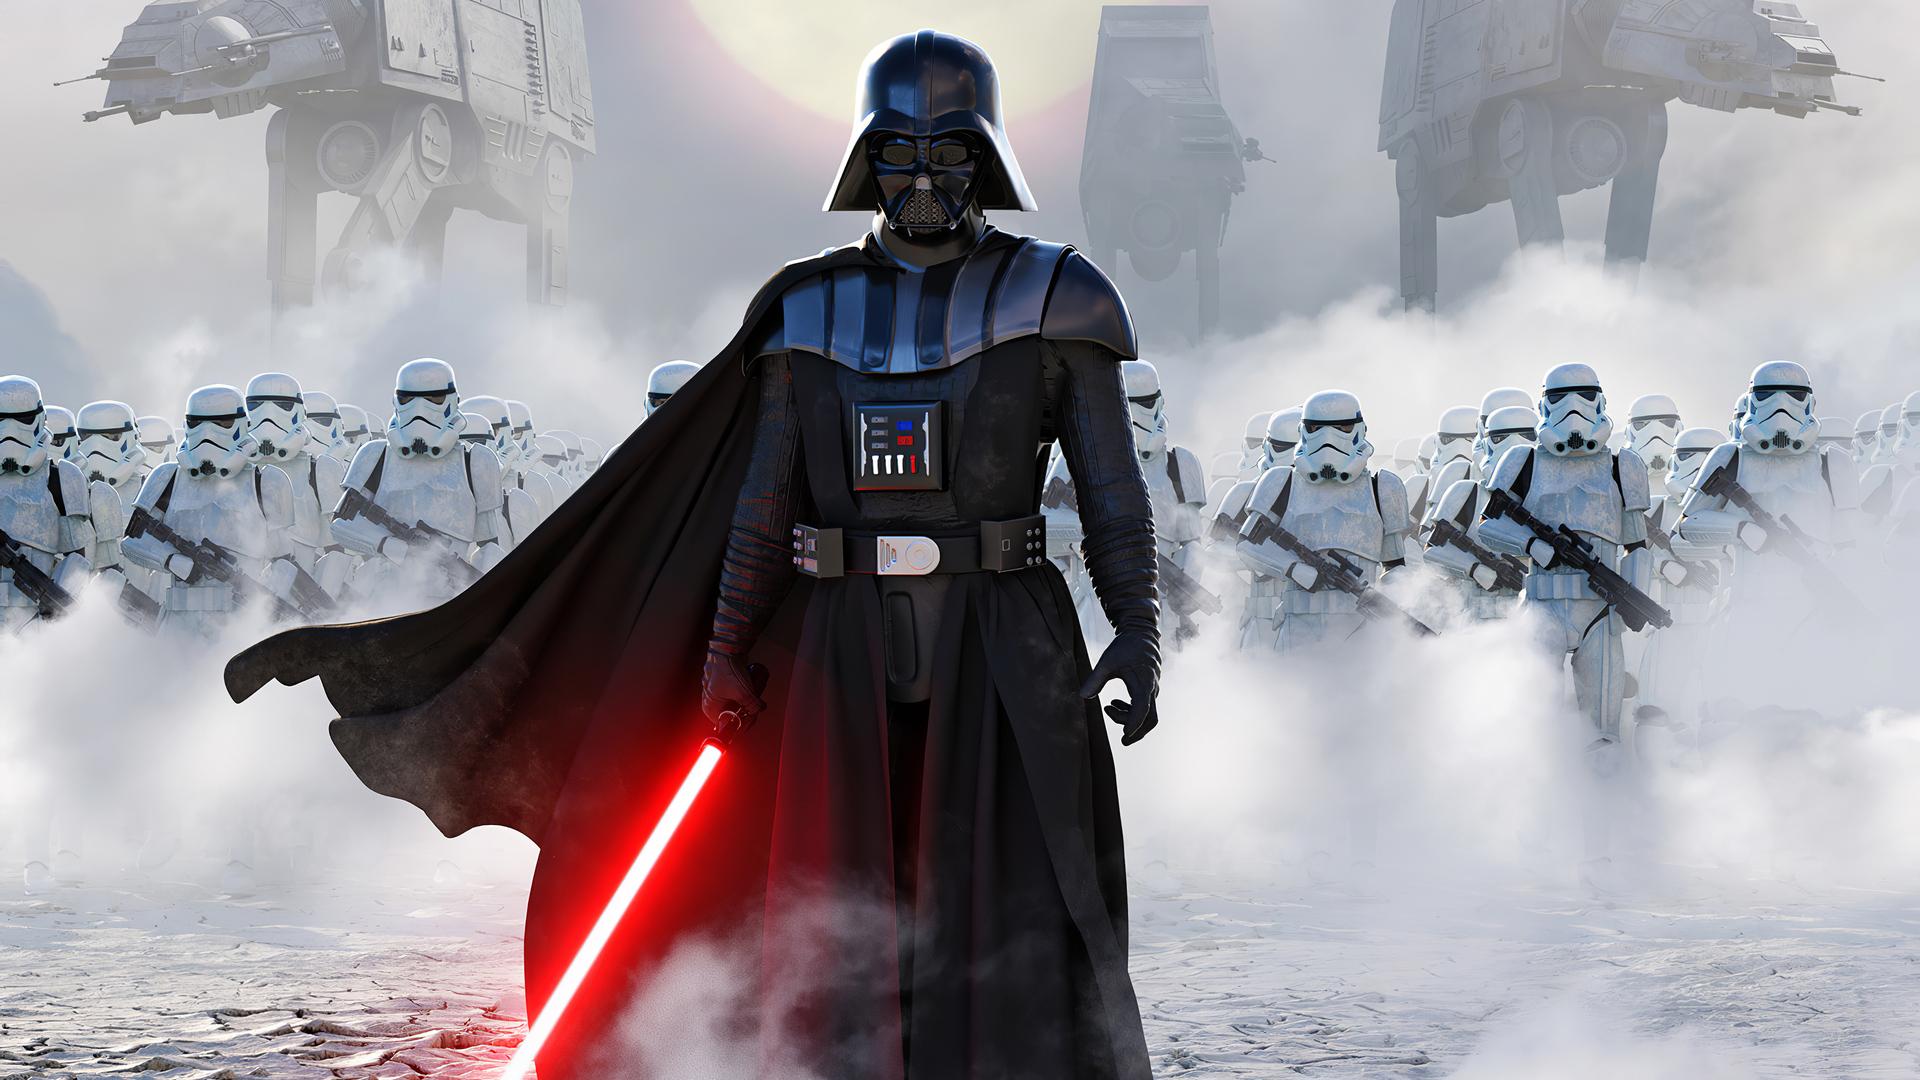 1920x1080 Star Wars Imperial March 4k Laptop Full HD 1080P ...